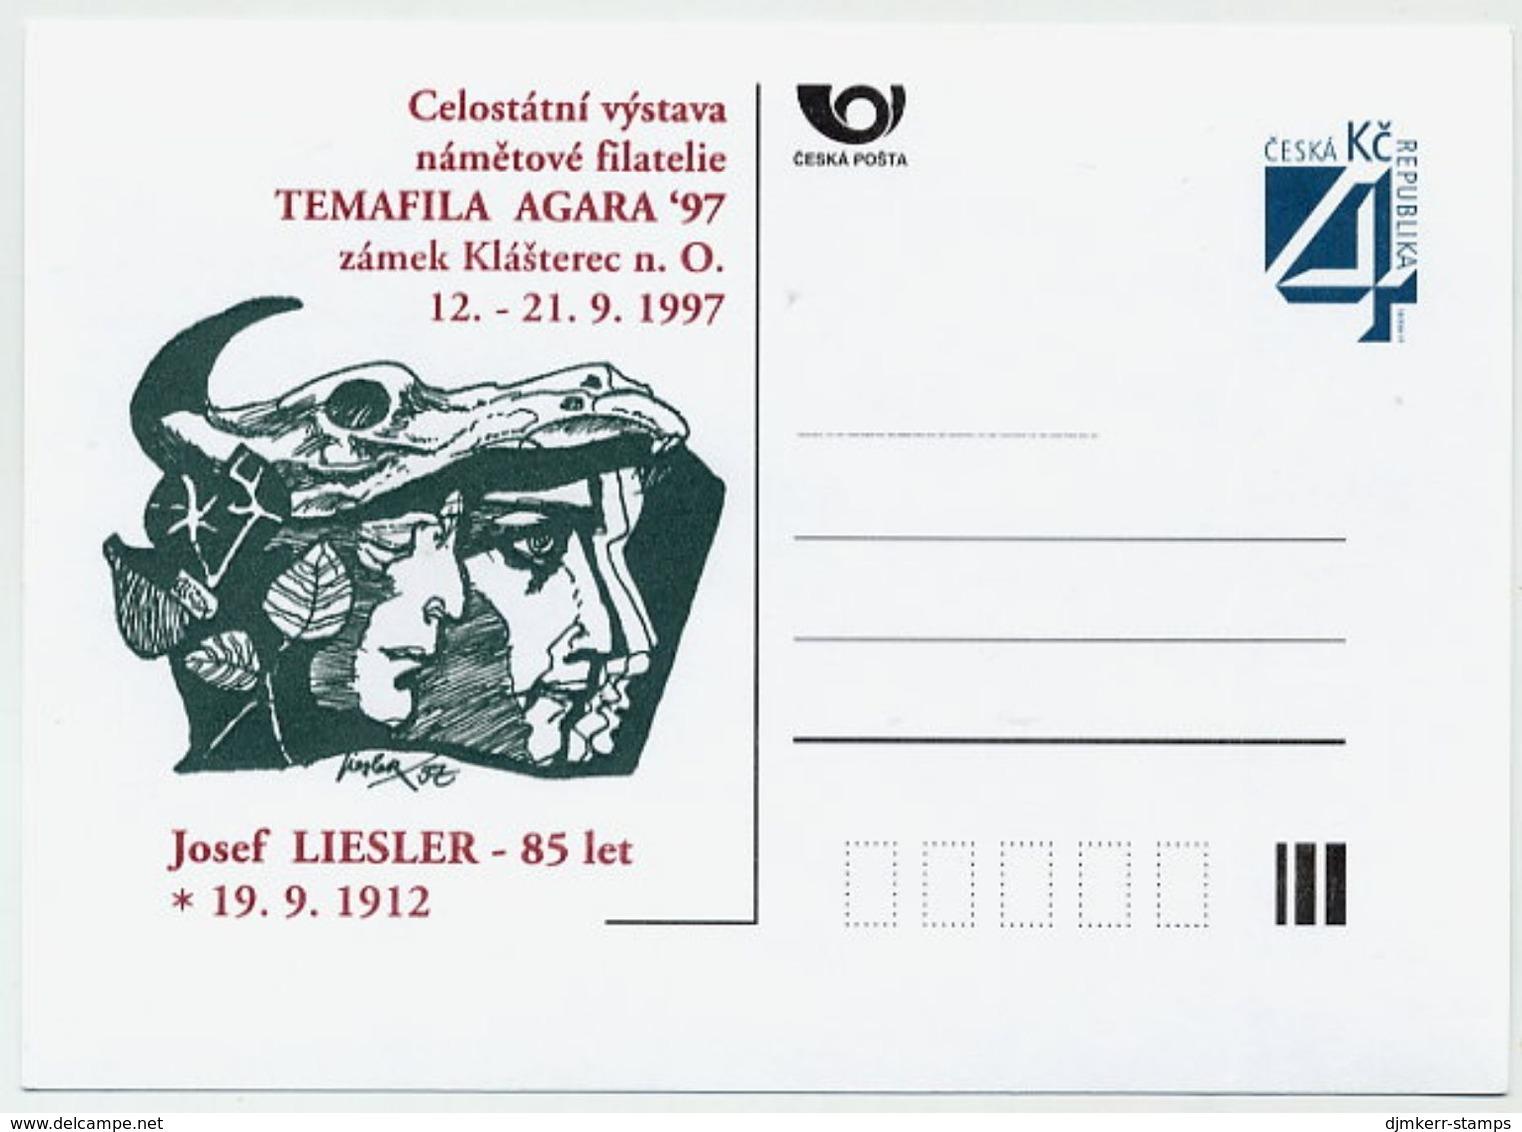 CZECH REPUBLIC 1997 Postcard TEMAFILA AGARA '97 Unused.  Michel P26-A5 - Postal Stationery